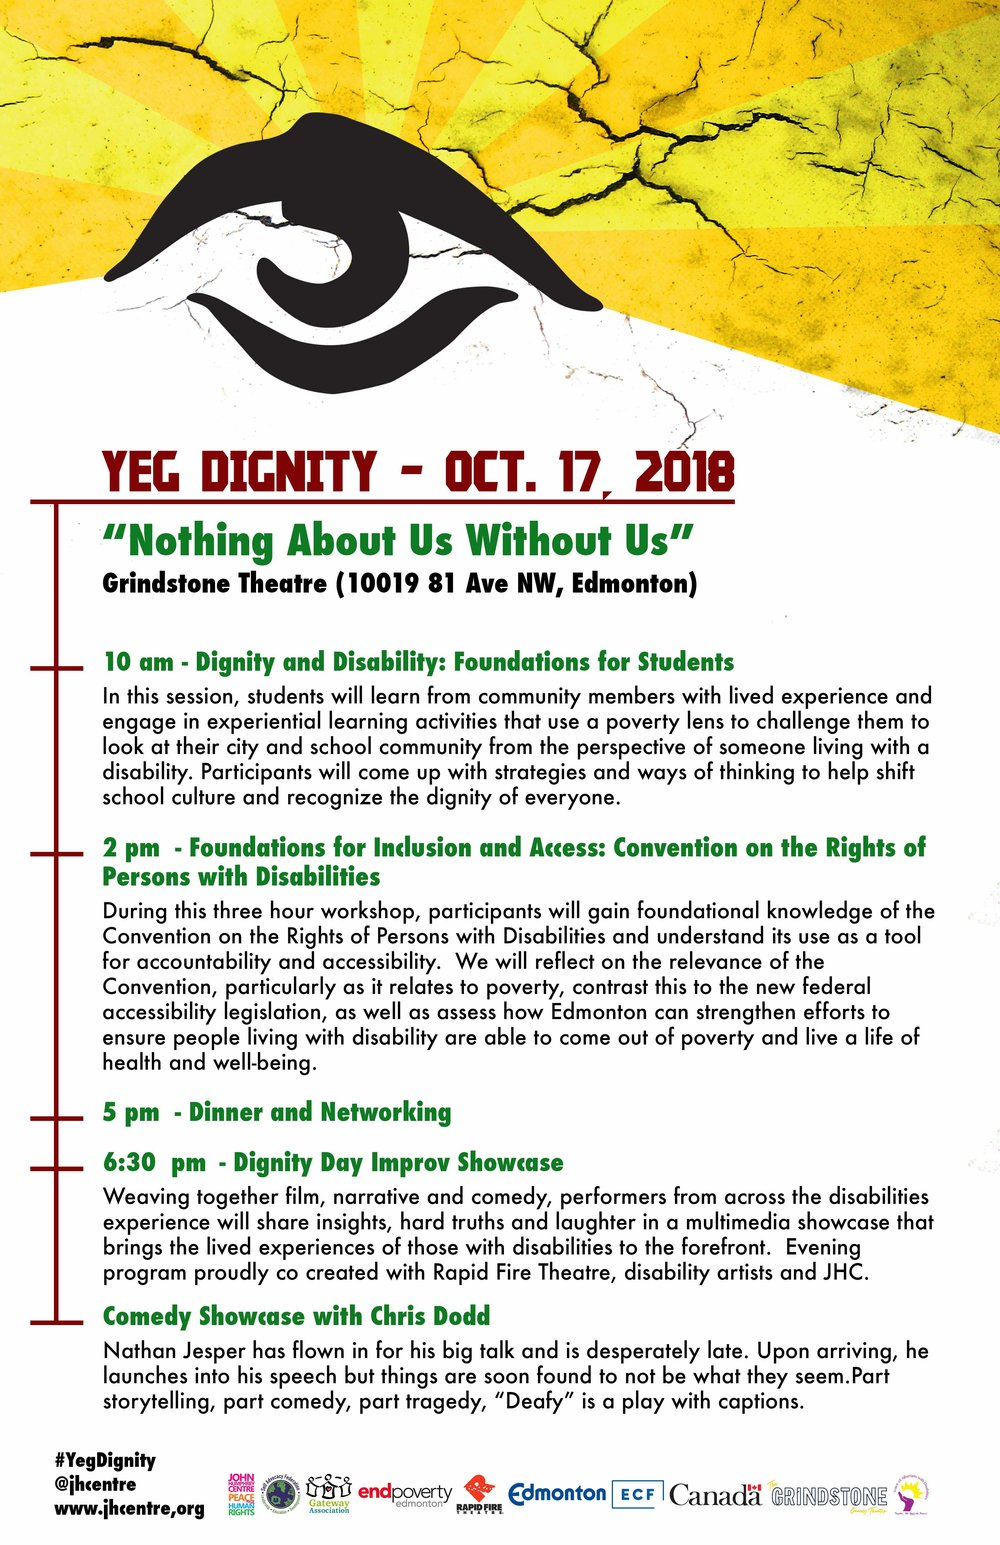 YEgDignity2018-Poster.jpg